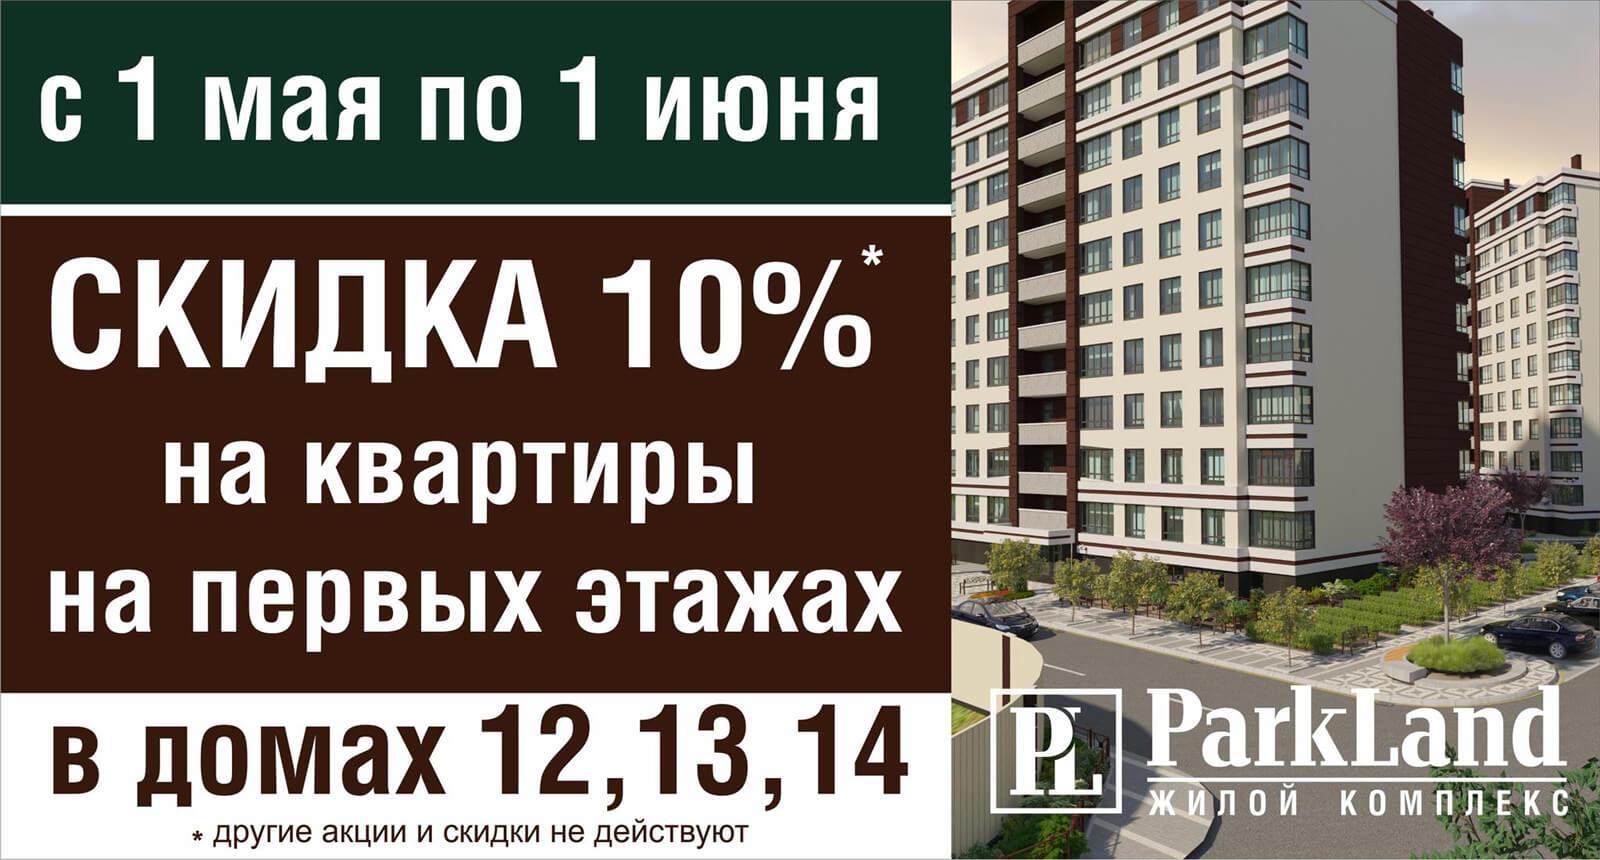 news_260418-ru